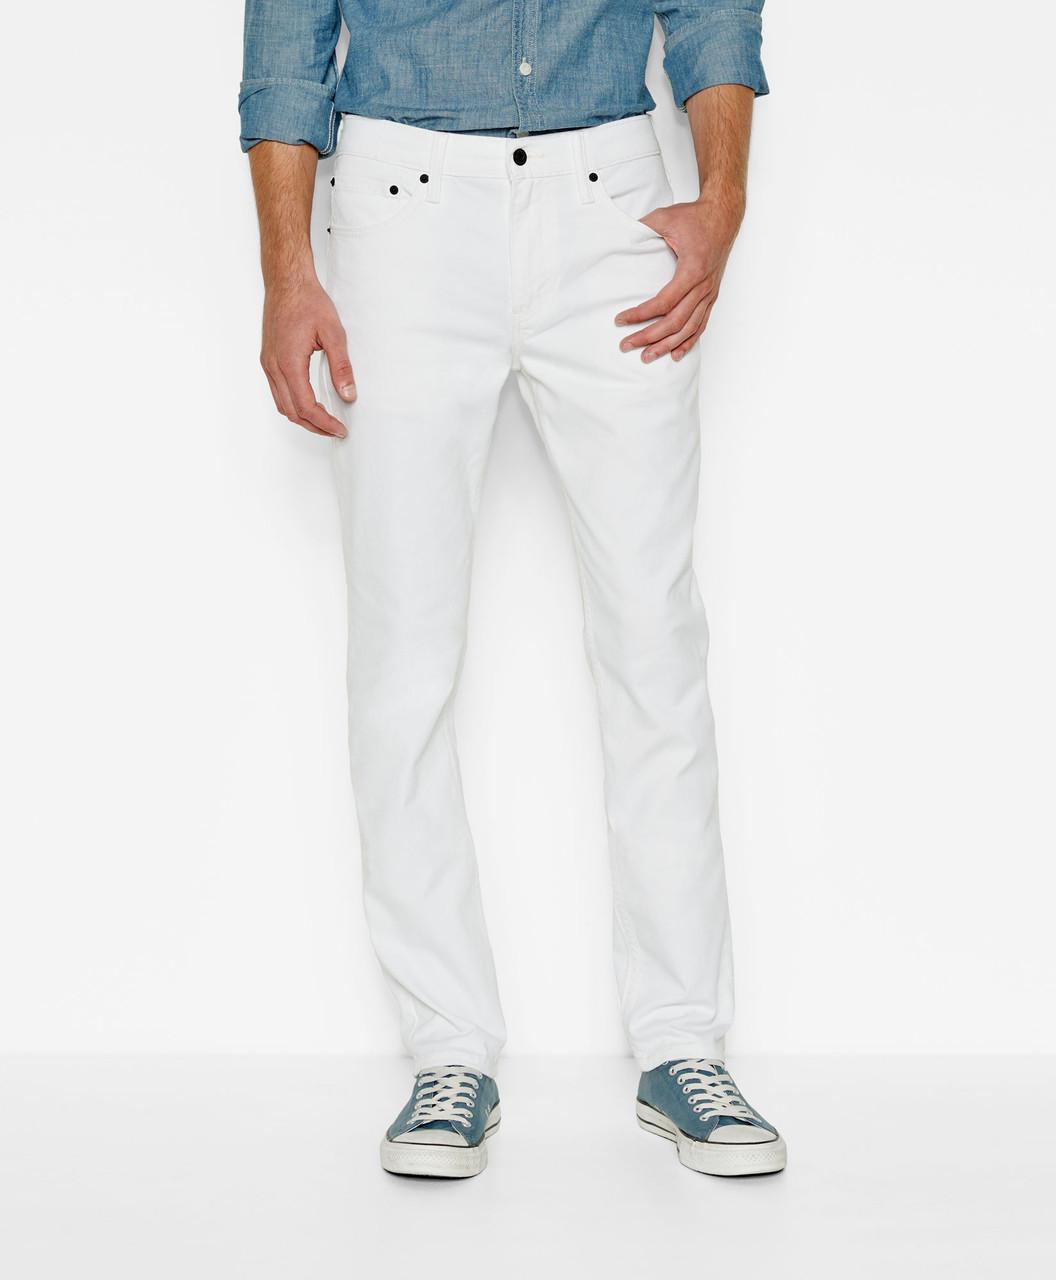 8a7922f651e Мужские джинсы Levis 511™ Slim Fit Jeans (White) белые - купить по ...